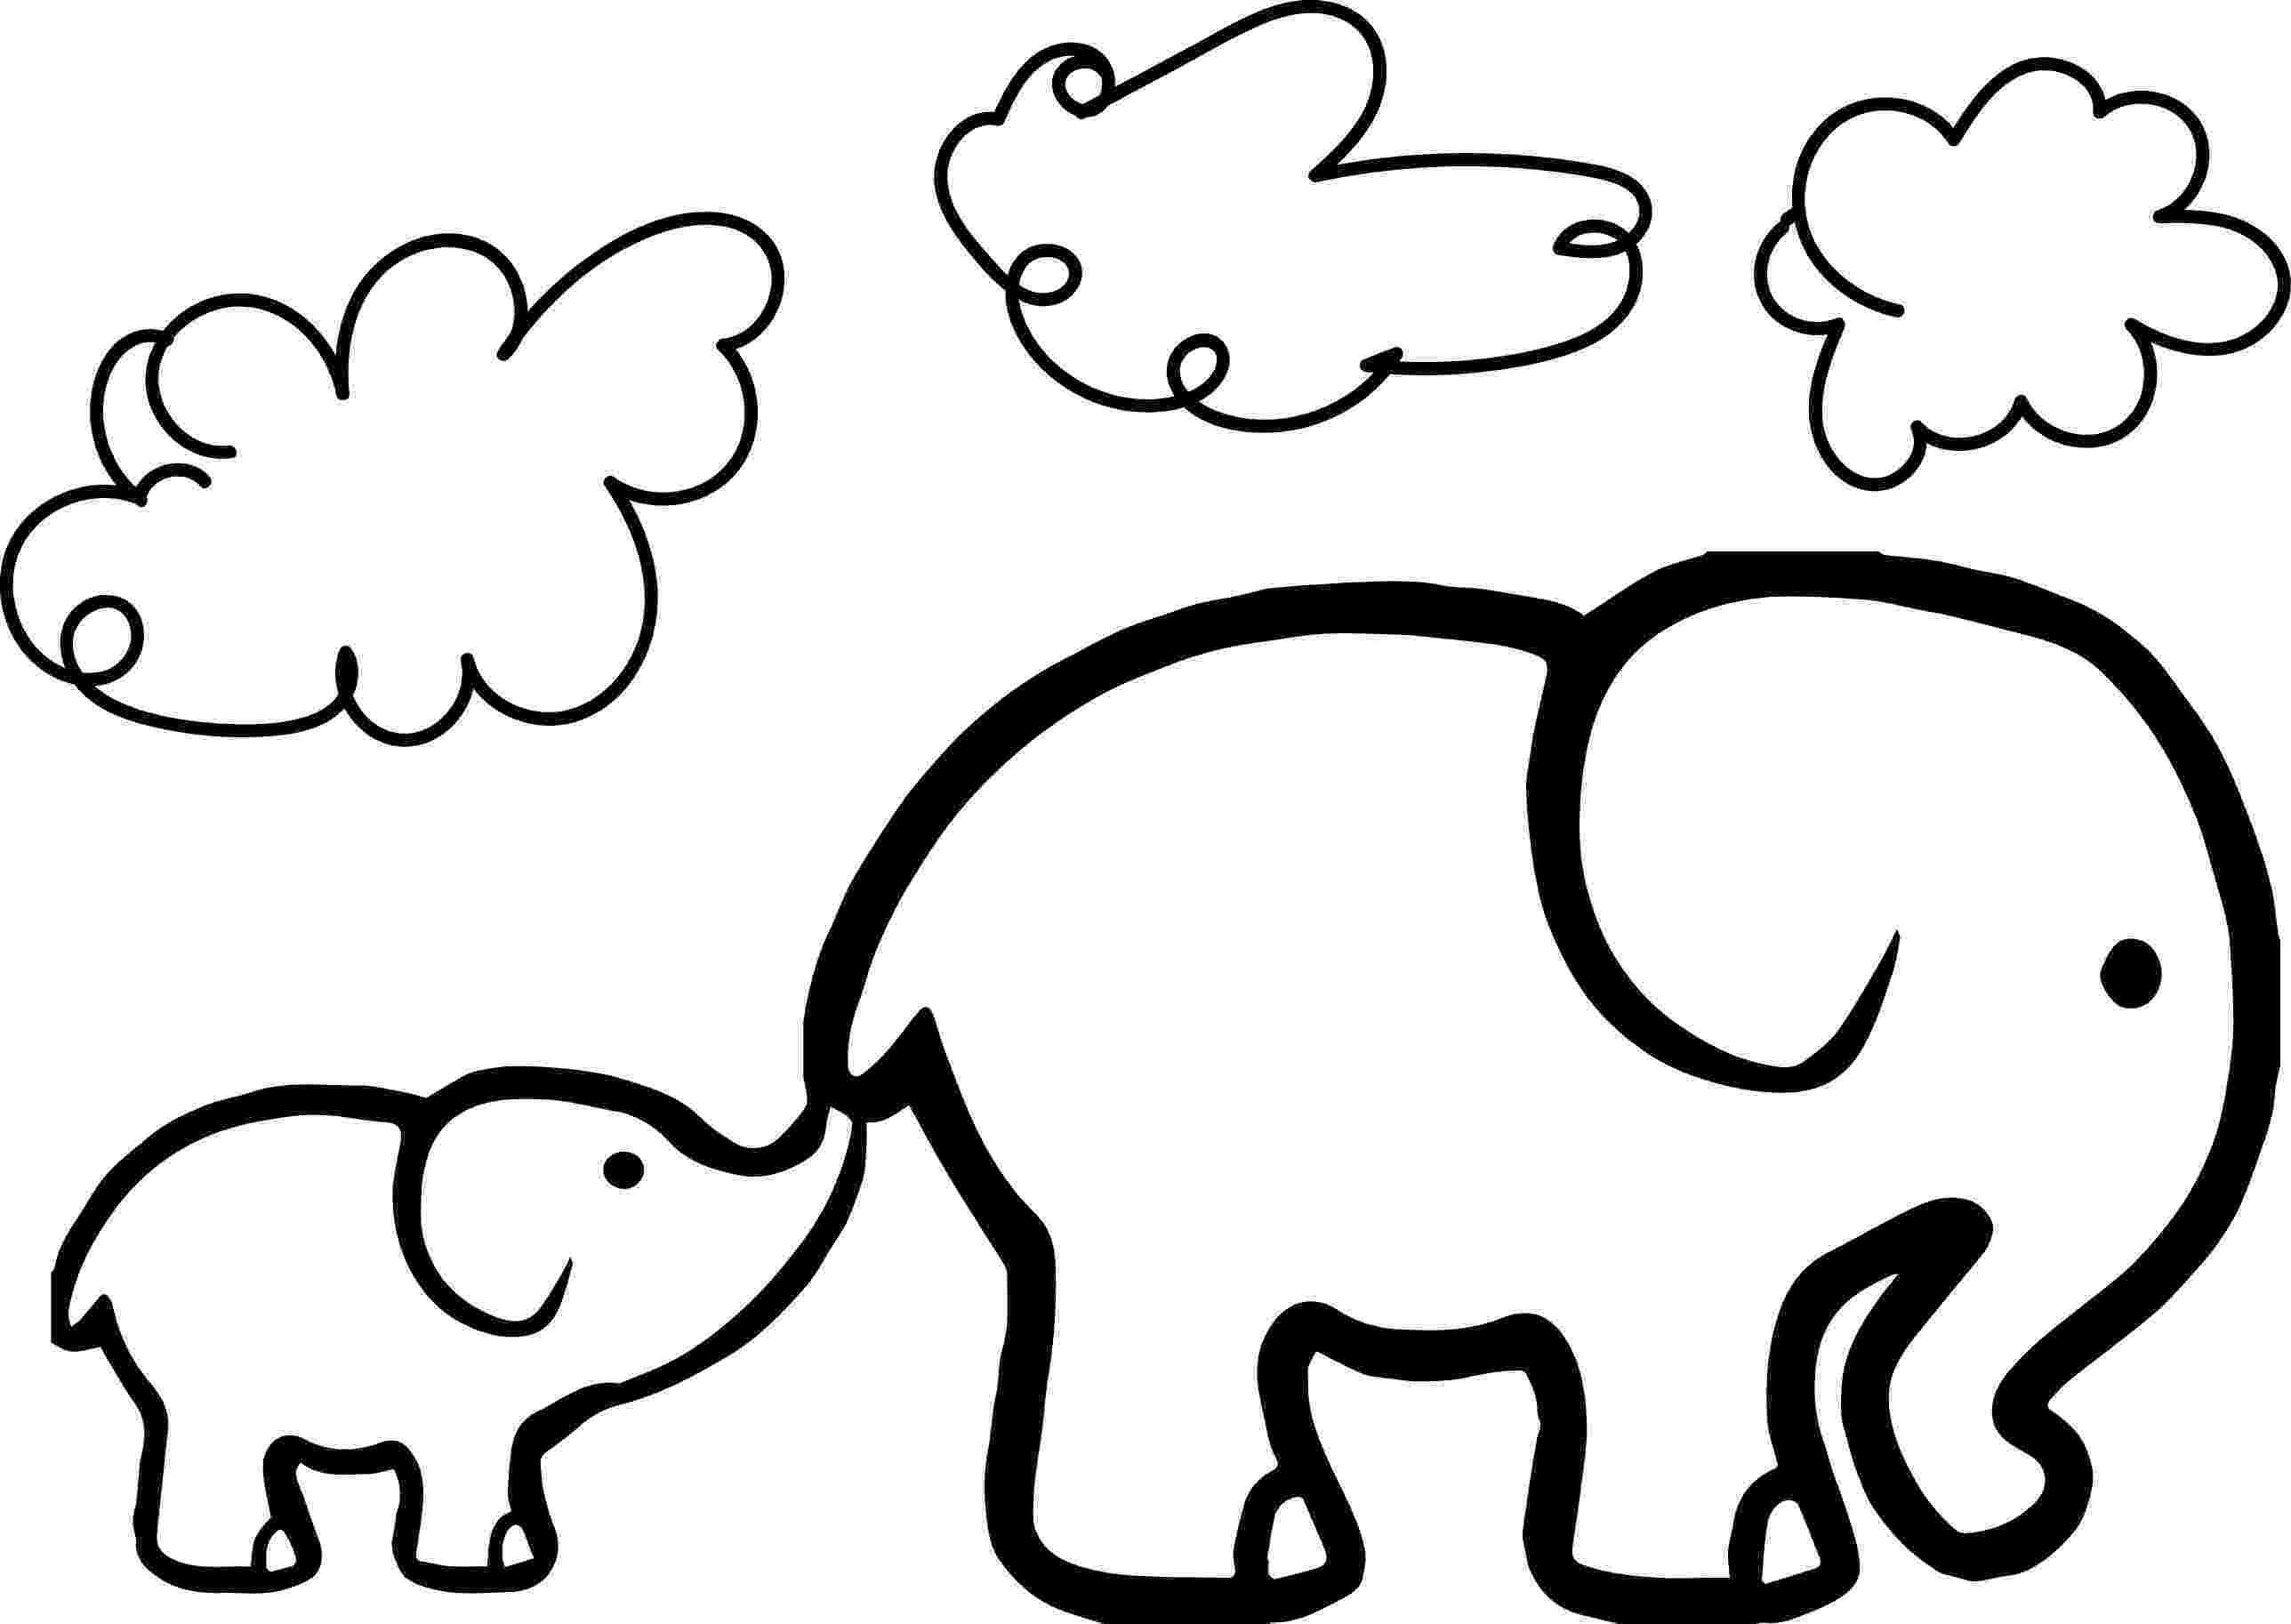 elephant color sheet free printable elephant coloring pages for kids sheet elephant color